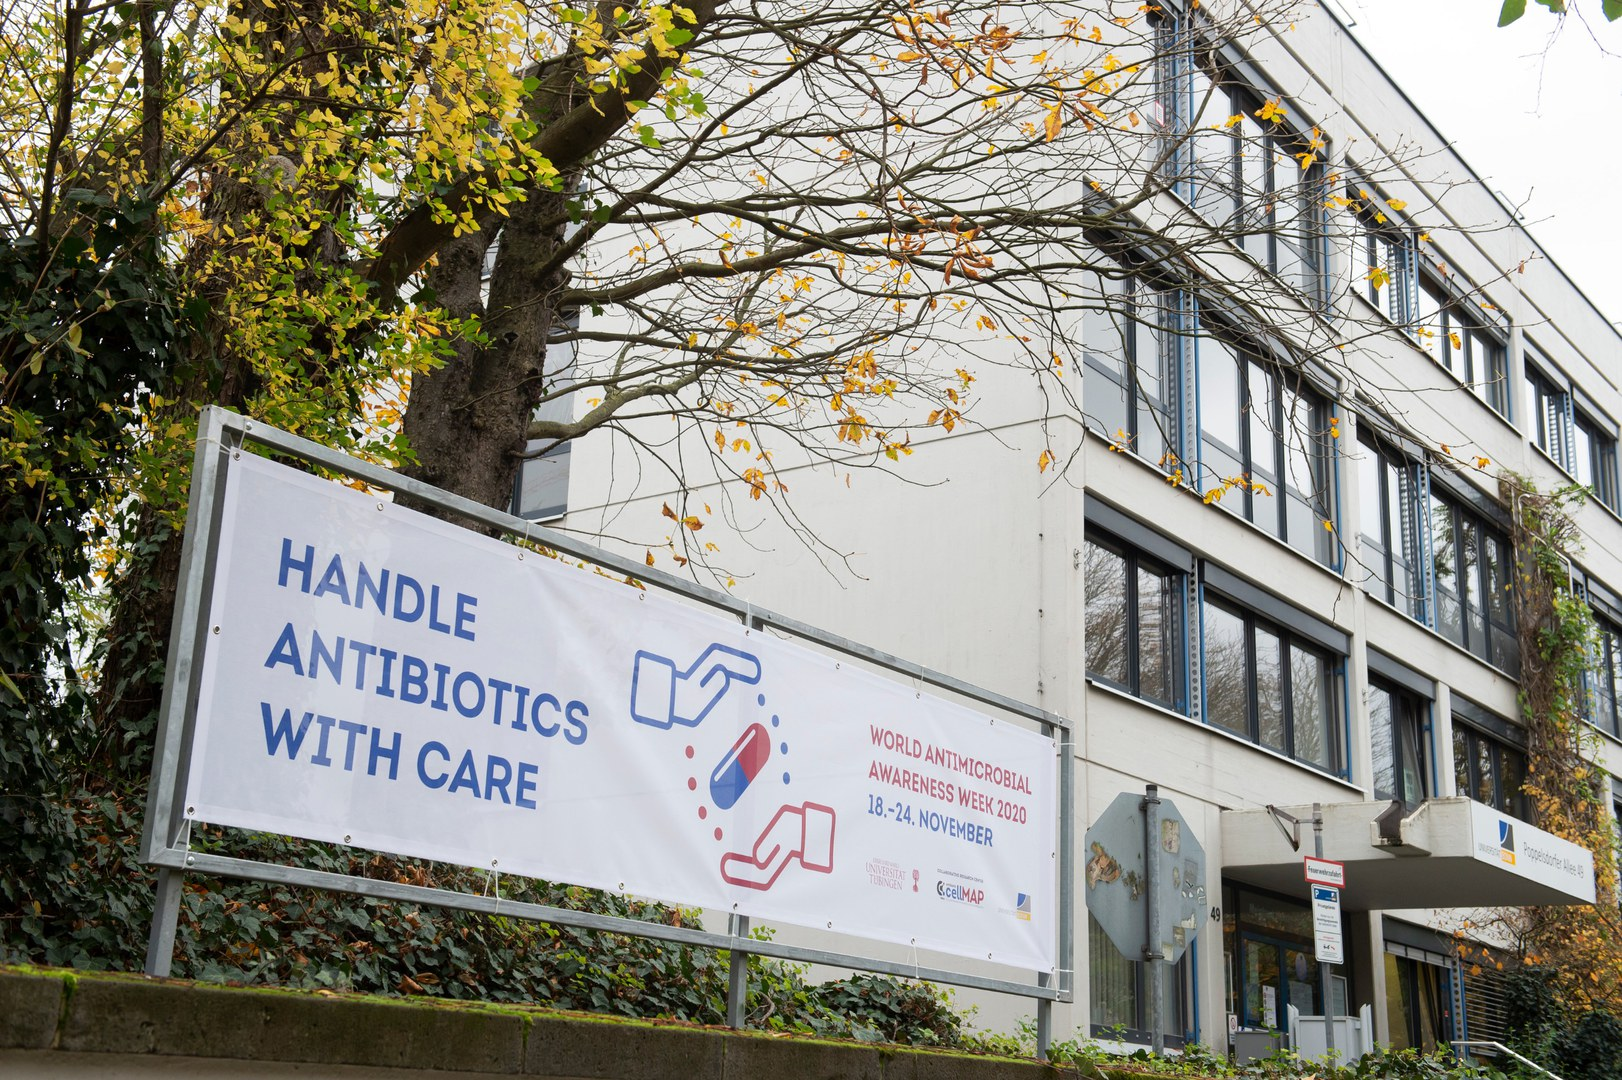 Waving a flag for antibiotics